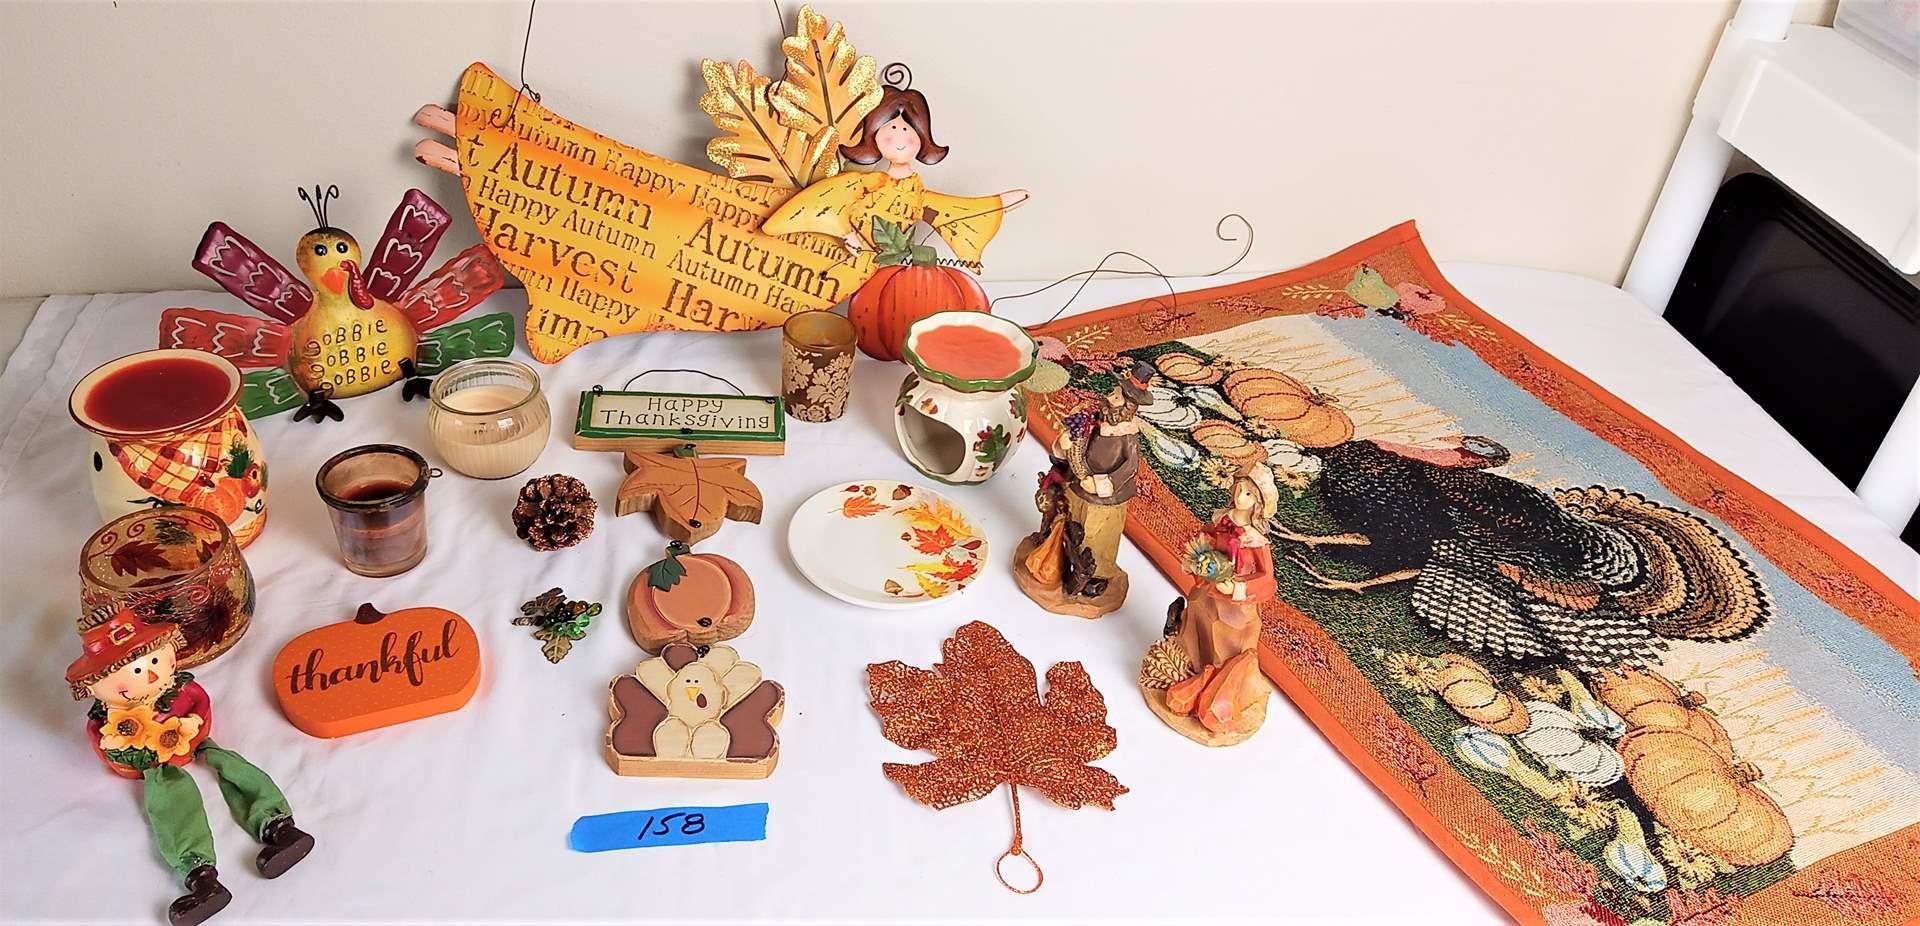 Lot # 158 Thanksgiving Collection: Hanging metal Sign, Floor Mat, 6 misc candle holders, Metal Turkey, wood pligrim figures,